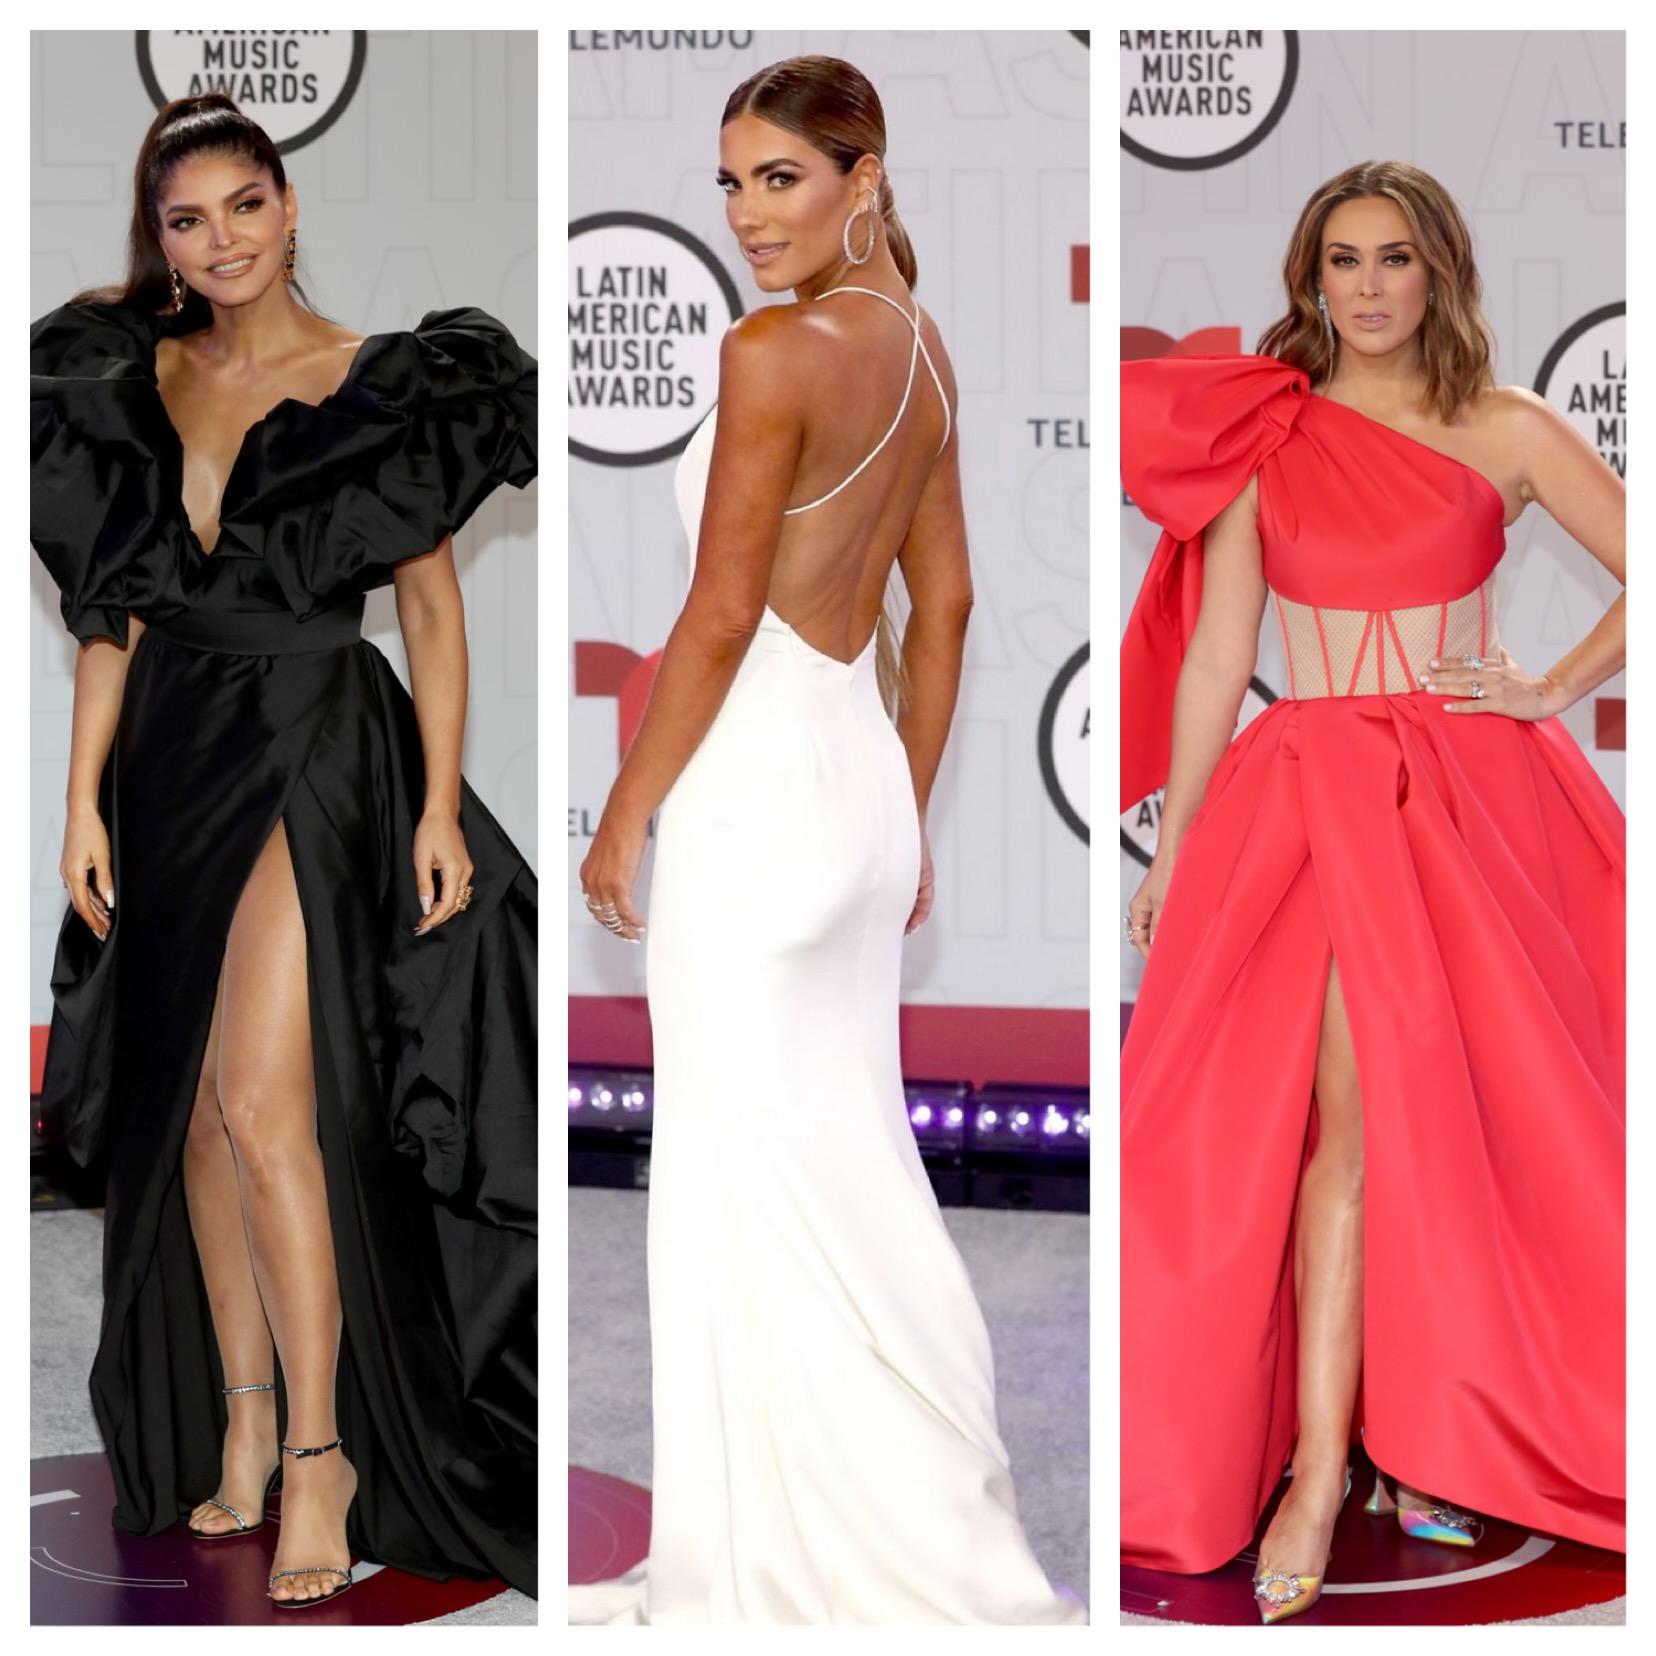 Latin American Music Awards, gaby espino, jacqueline bracaomontes, Ana Barbara